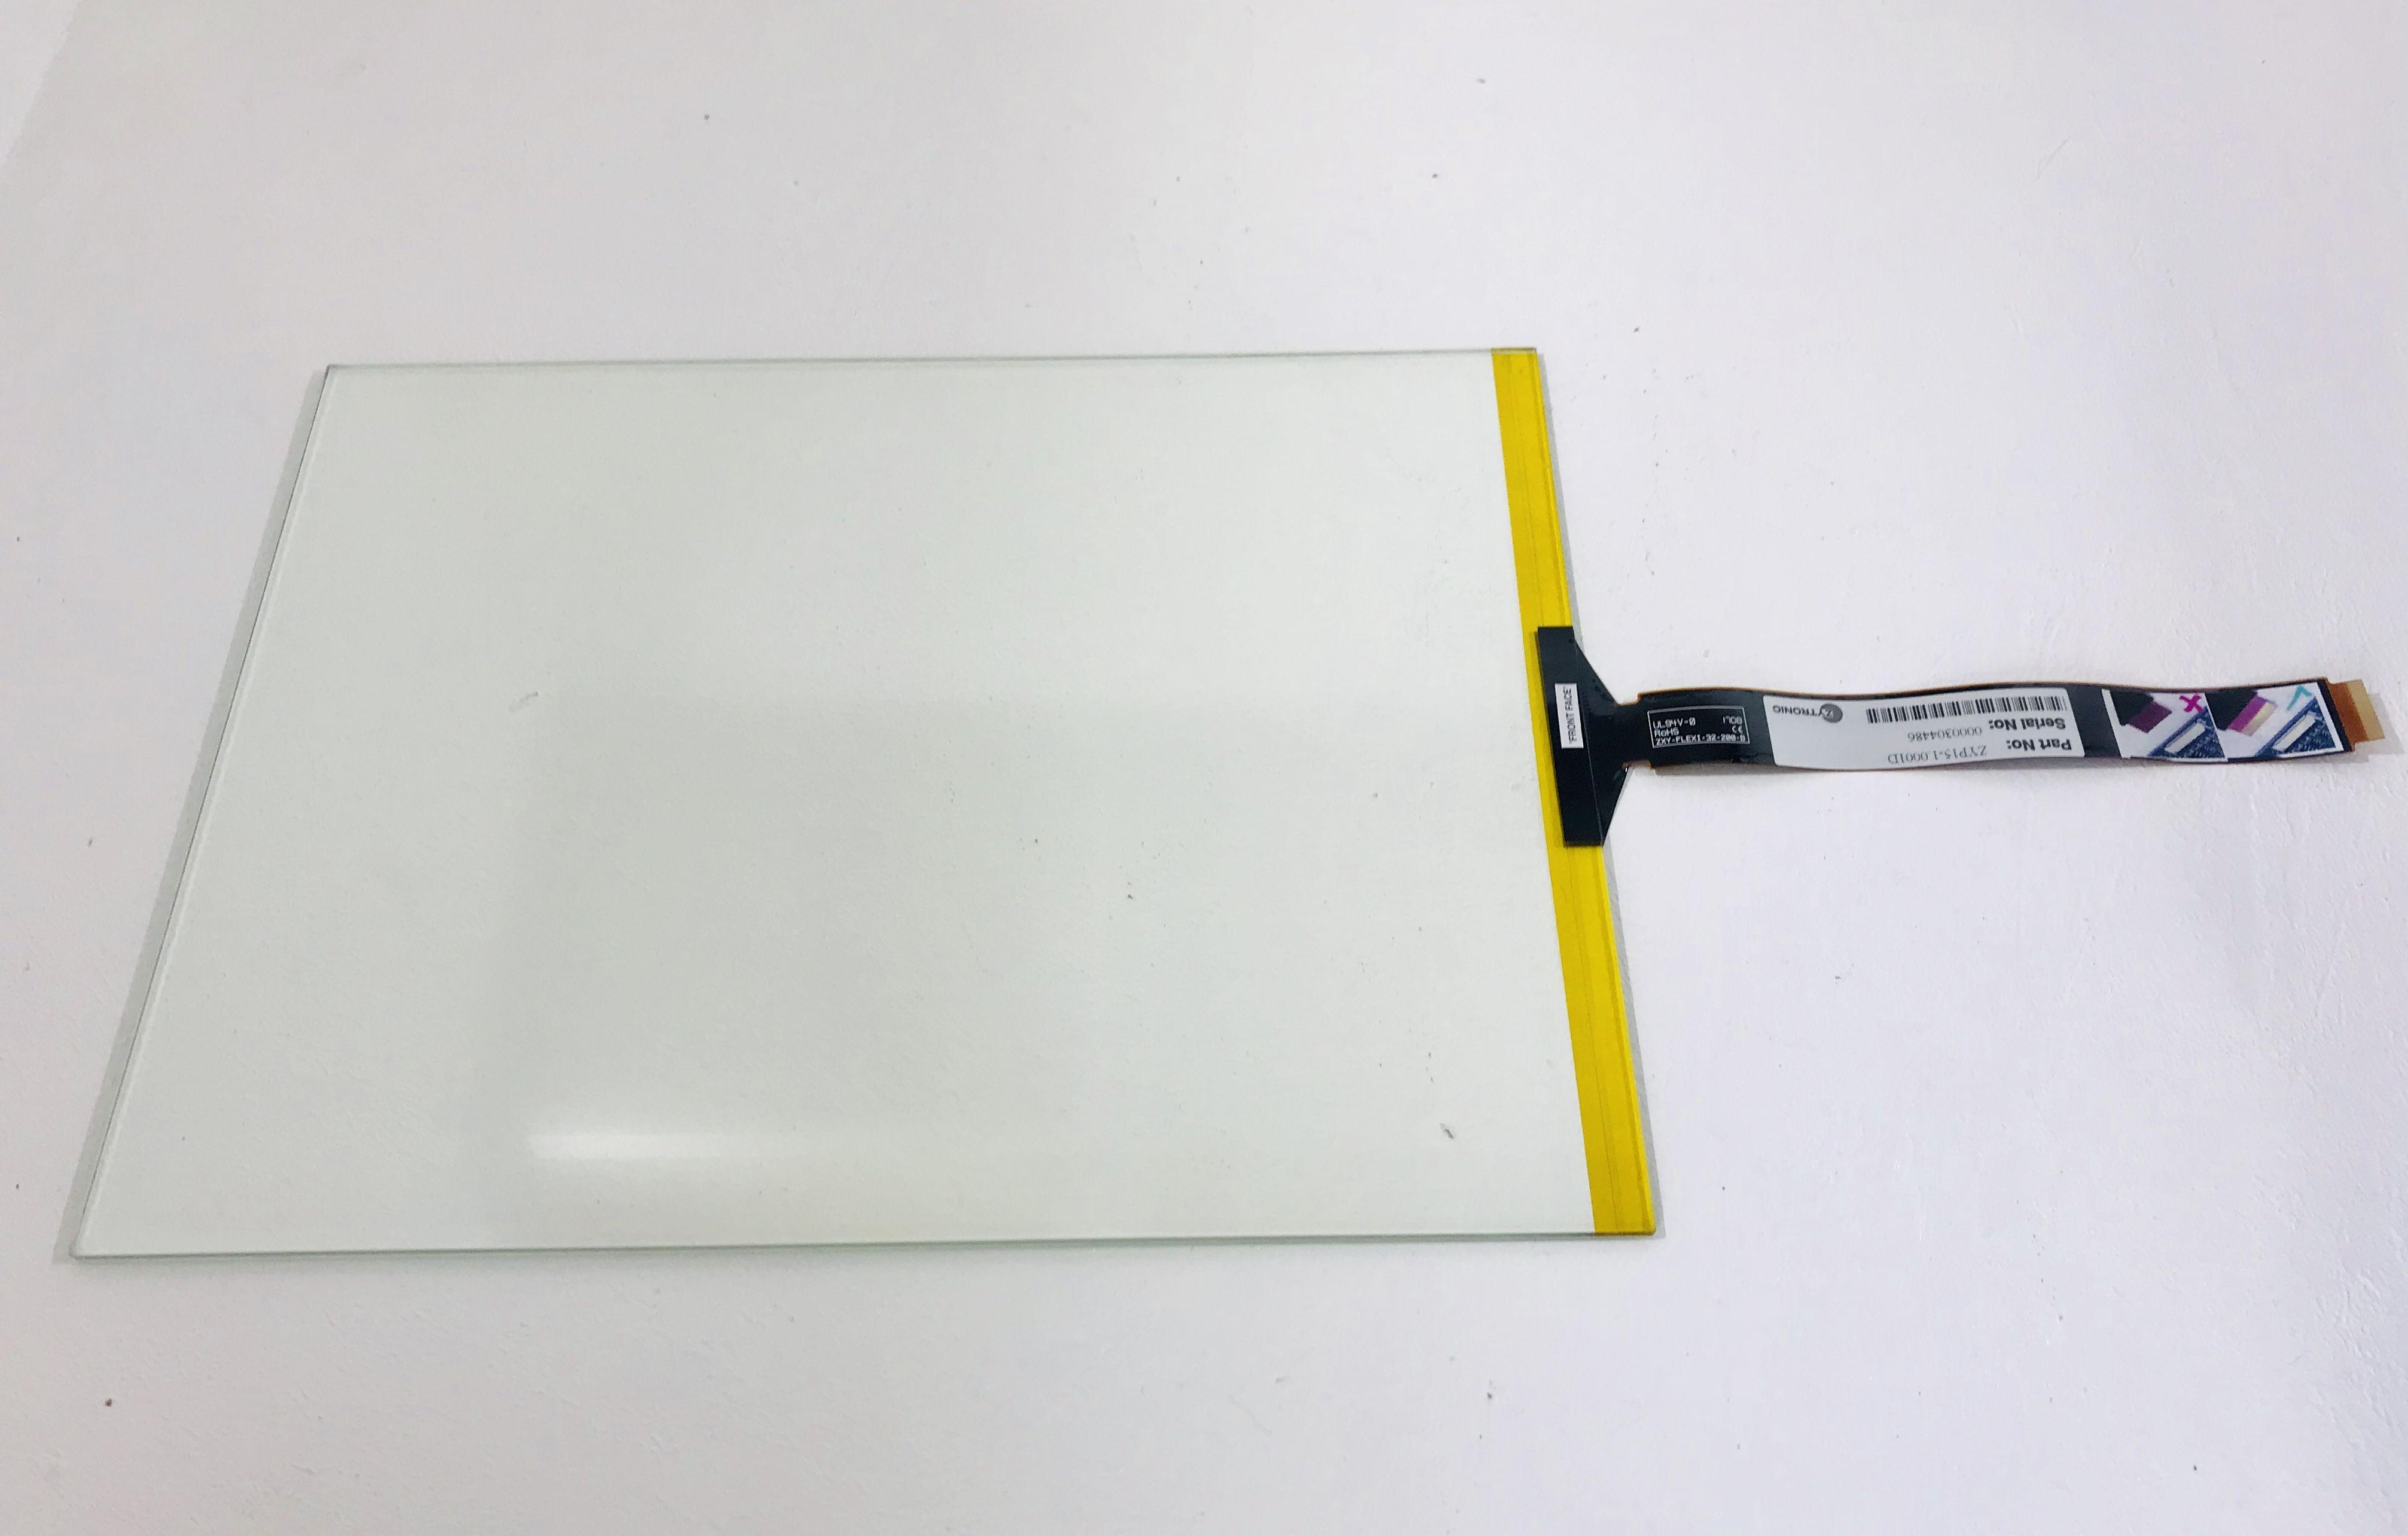 ZYTRONIC ZYP15-1.0001D Touchscreen Digitizer Industrie Touchpanel